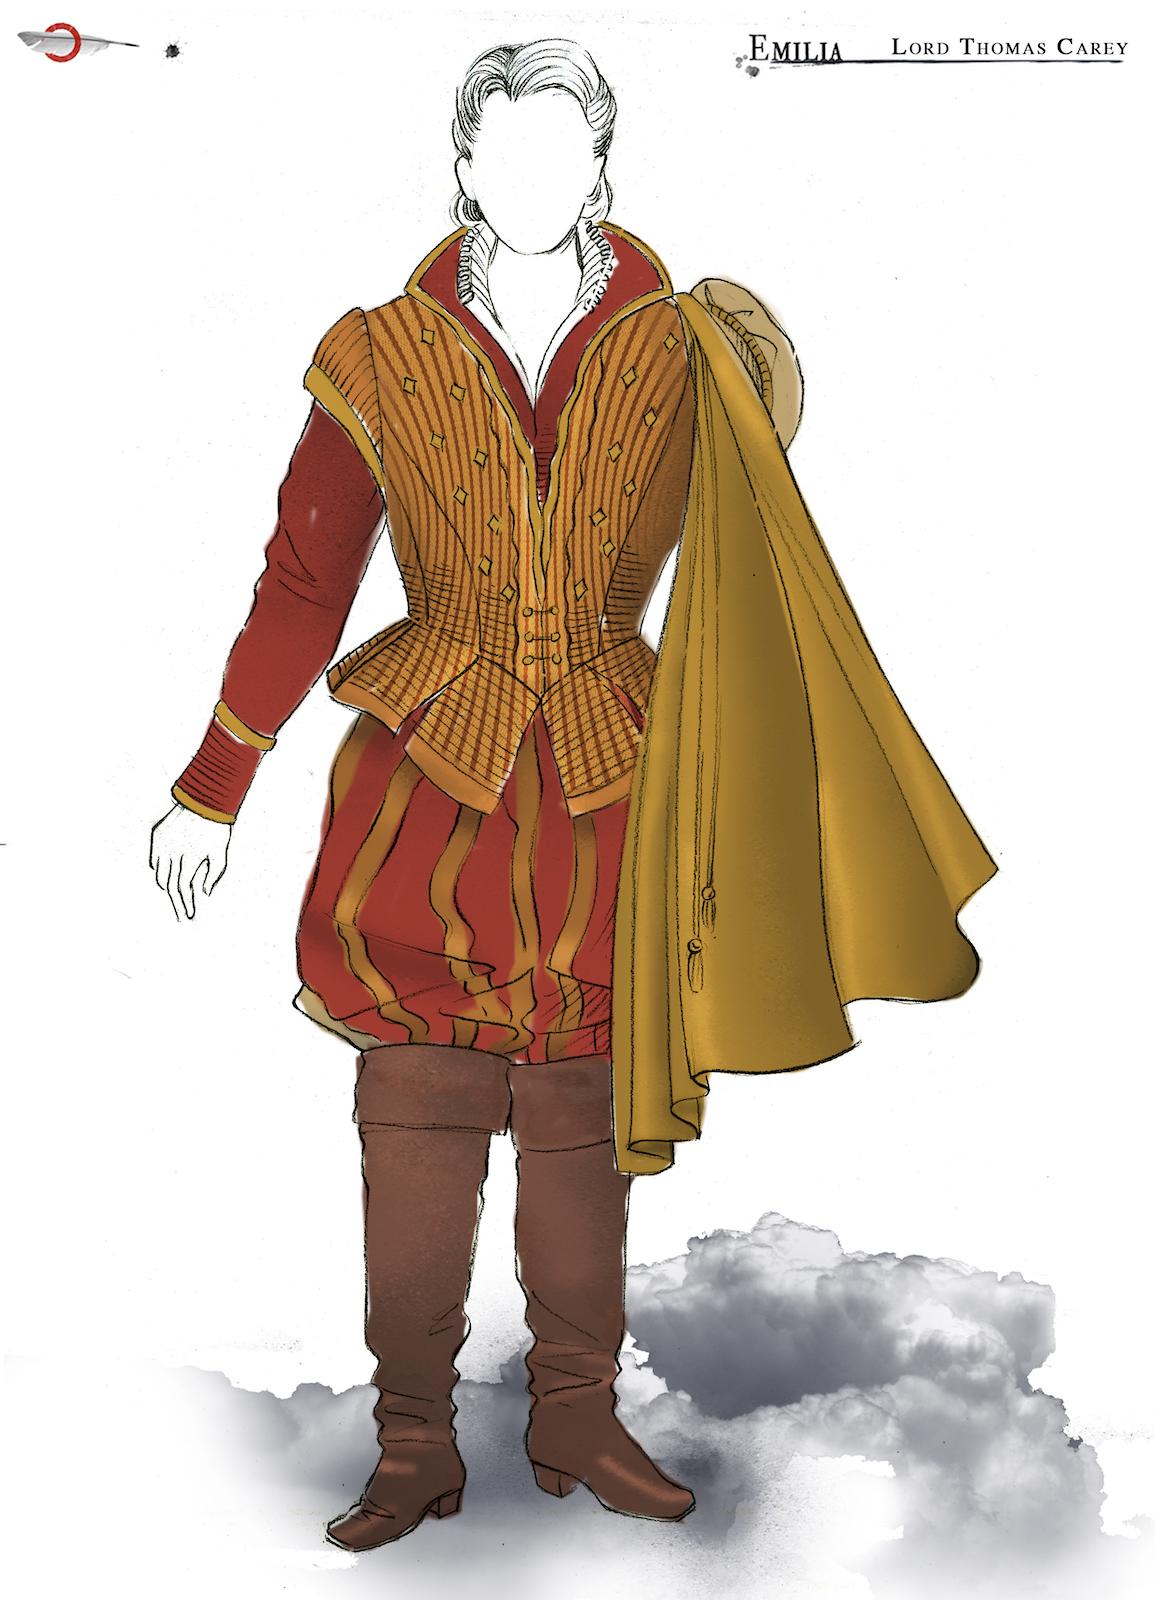 A sketch of a male Elizabethan costume